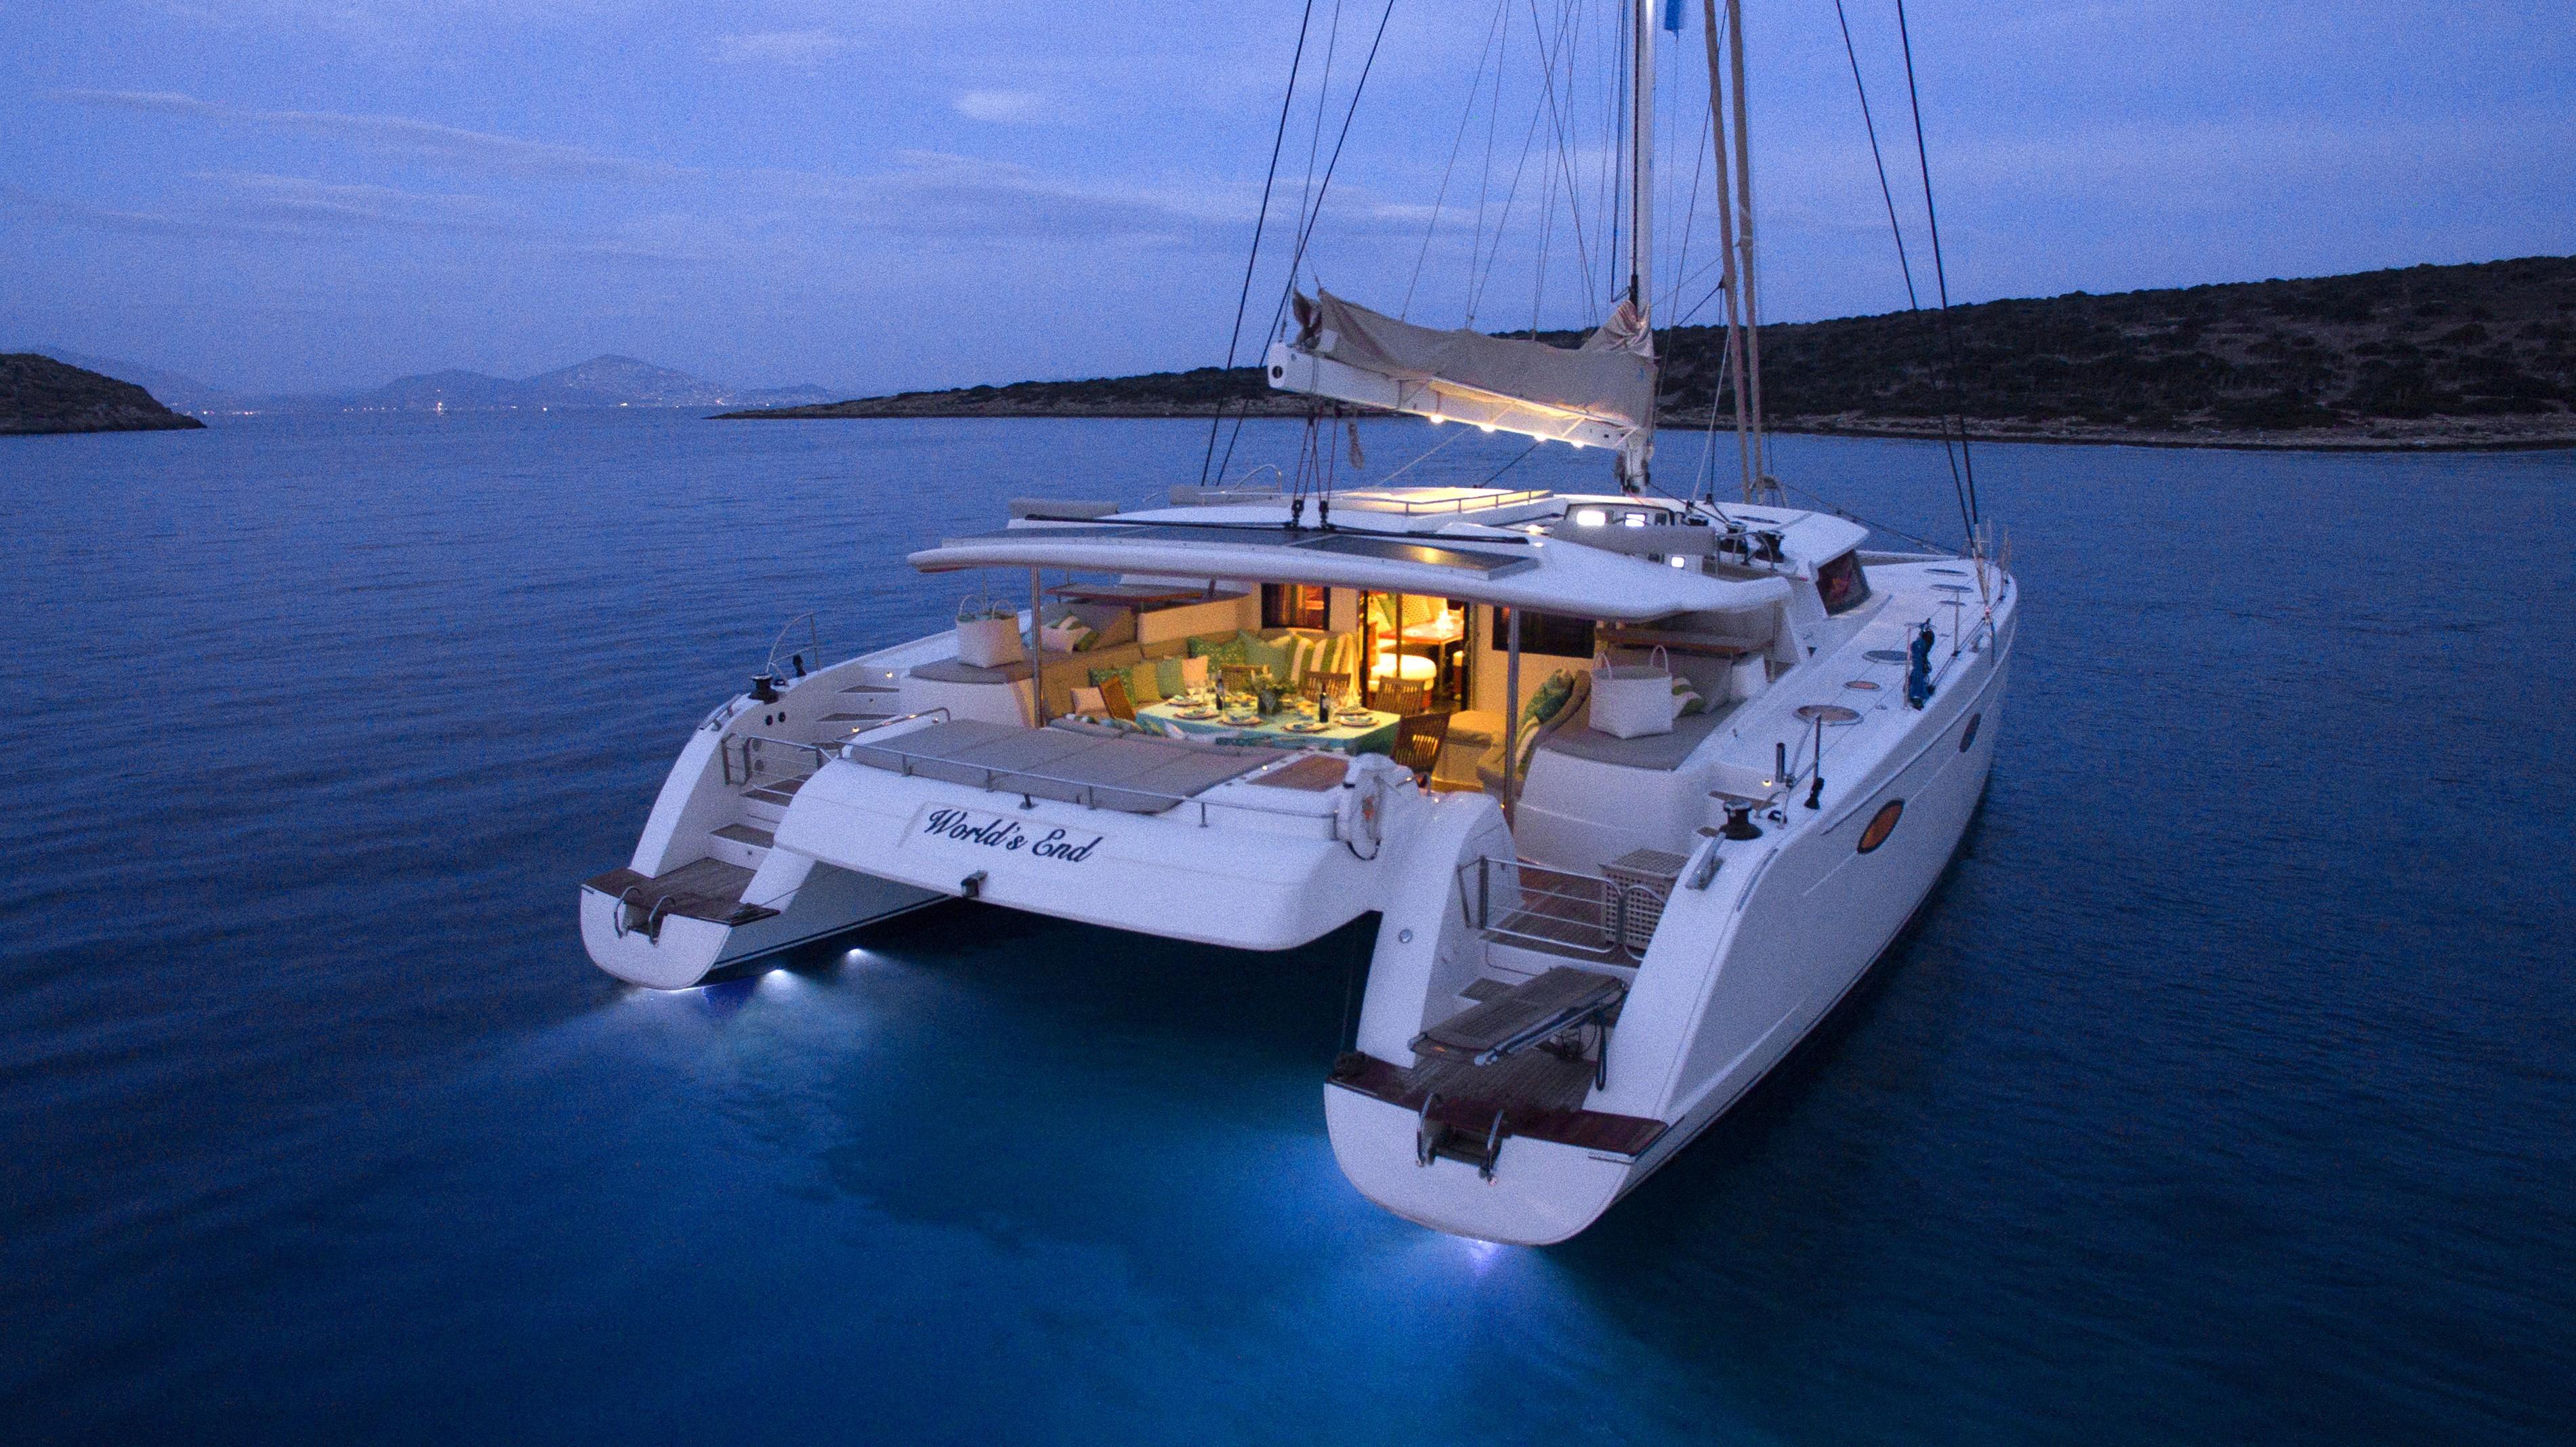 Location de catamaran en gr ce for Catamarani di lusso